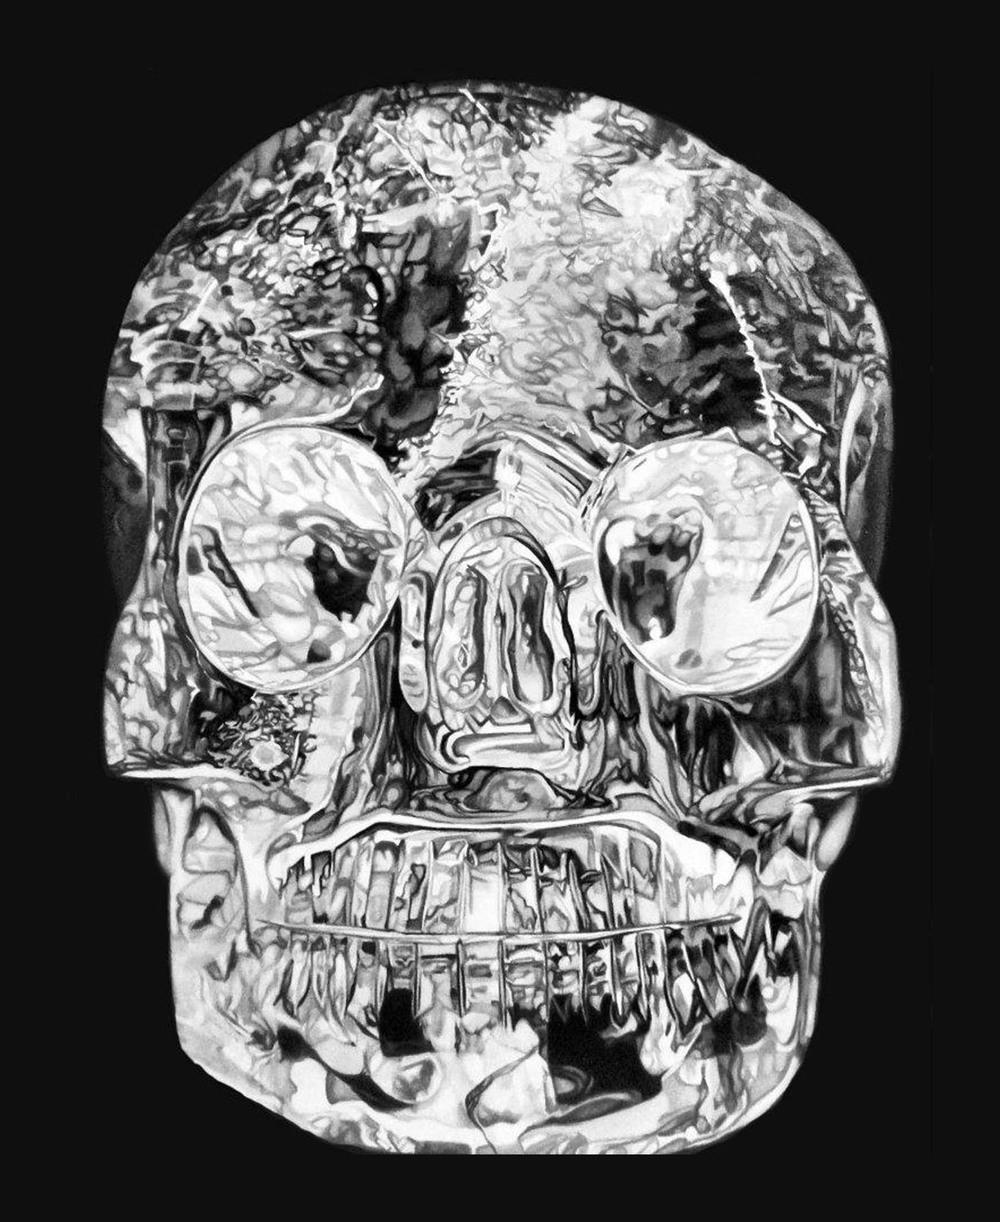 Skull of Doom Black 18x24 .jpg